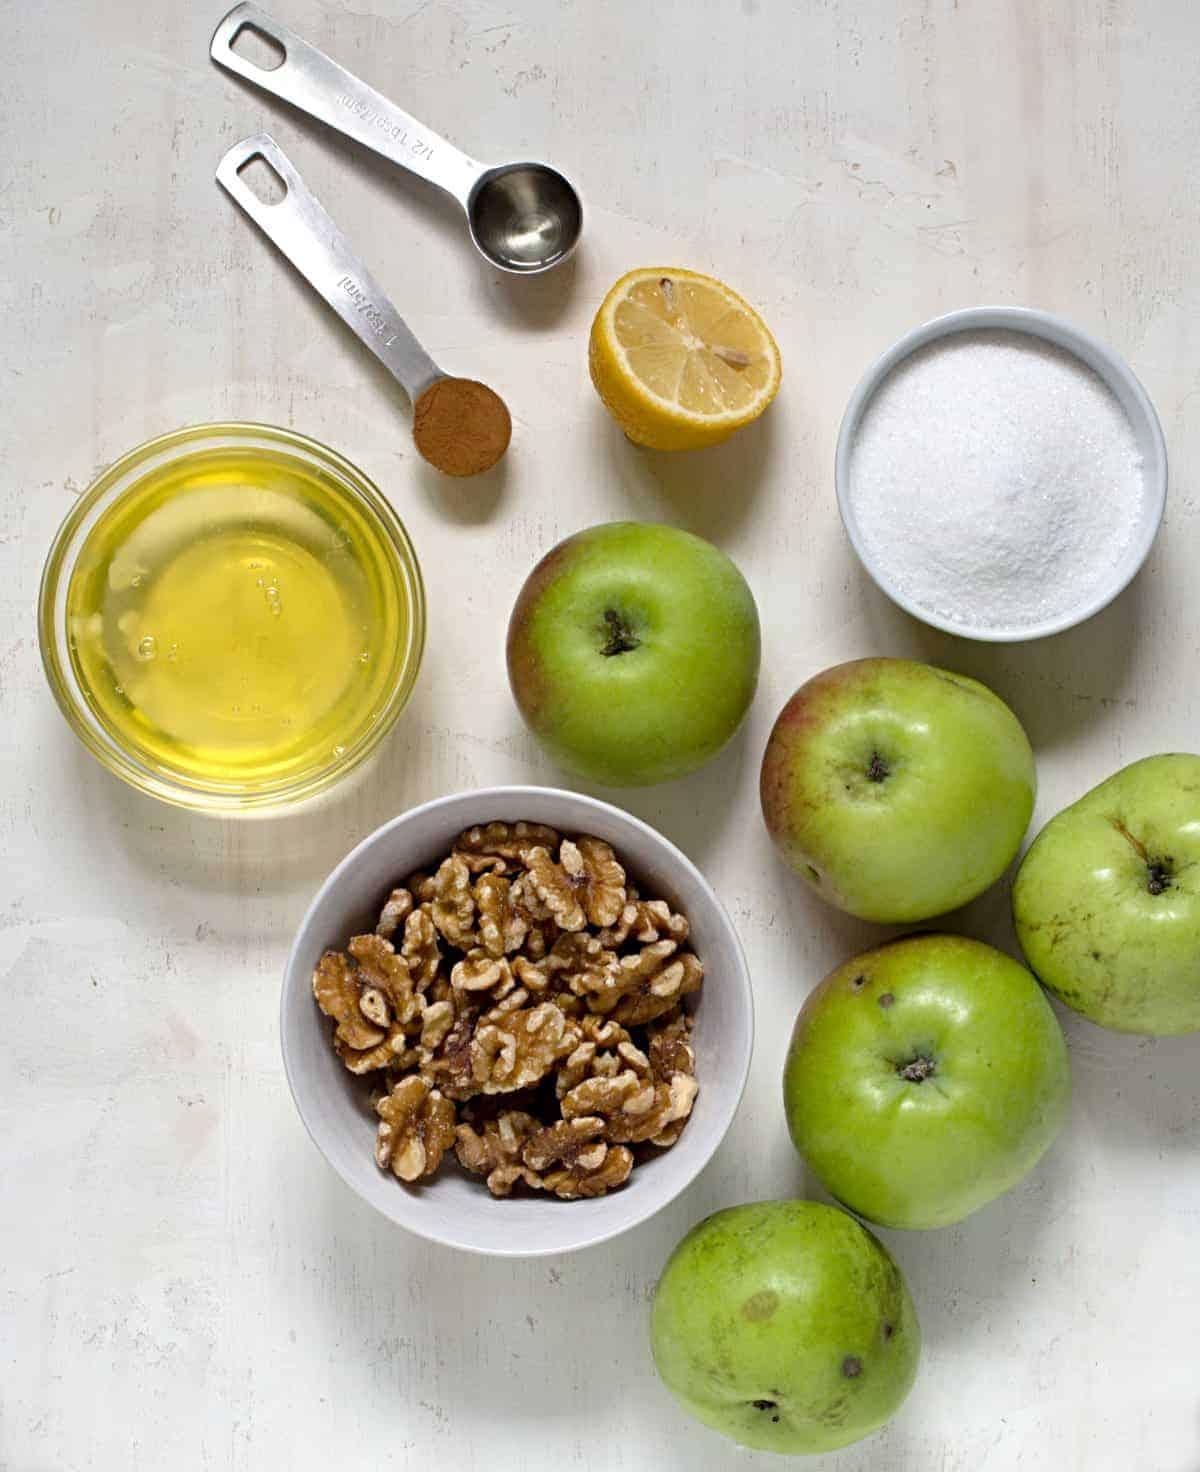 Ingredients for apple slice.